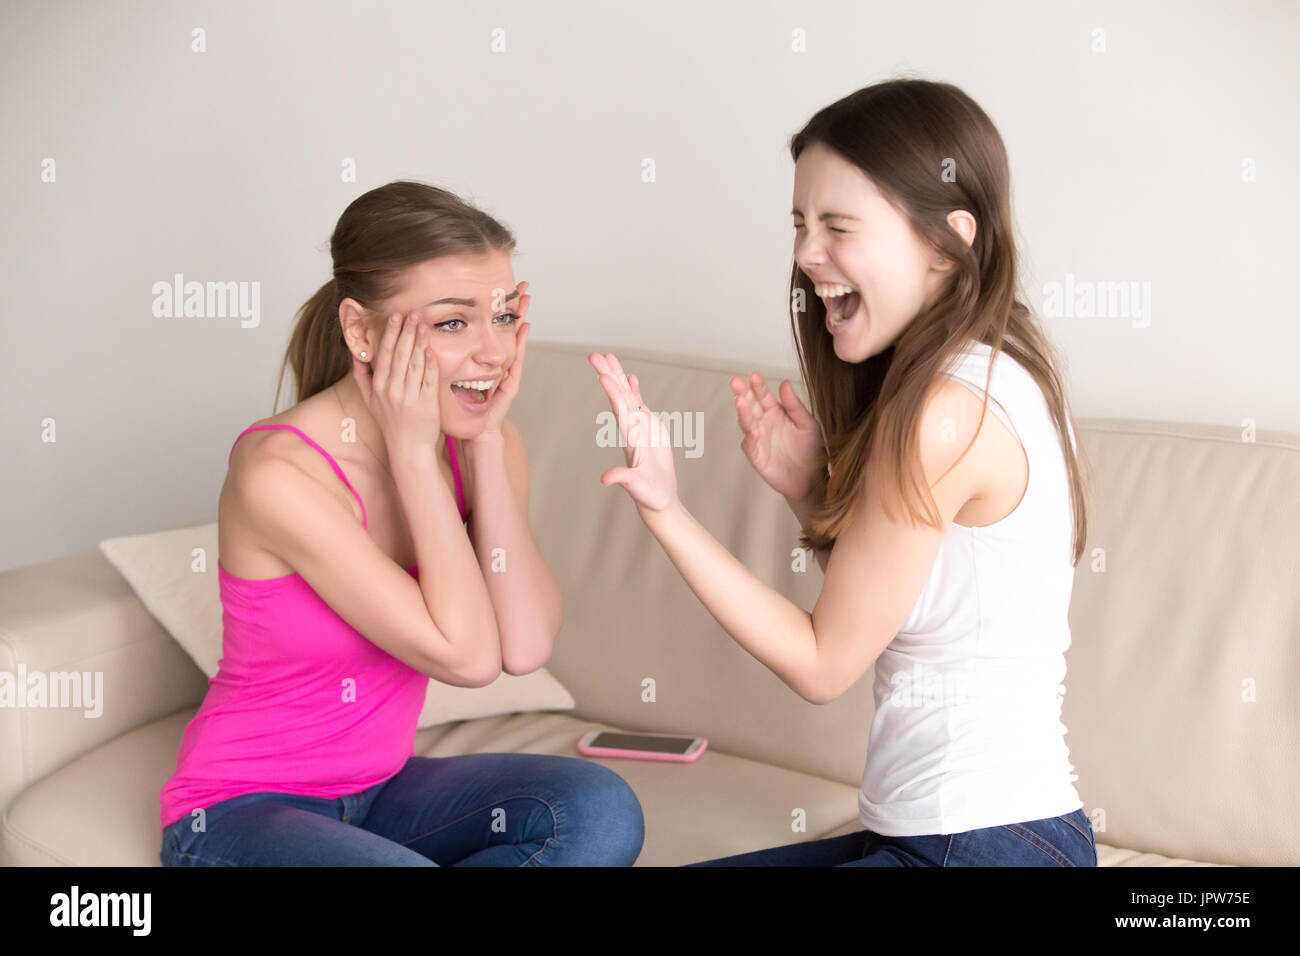 Happy young ladies celebrating wedding proposal - Stock Image